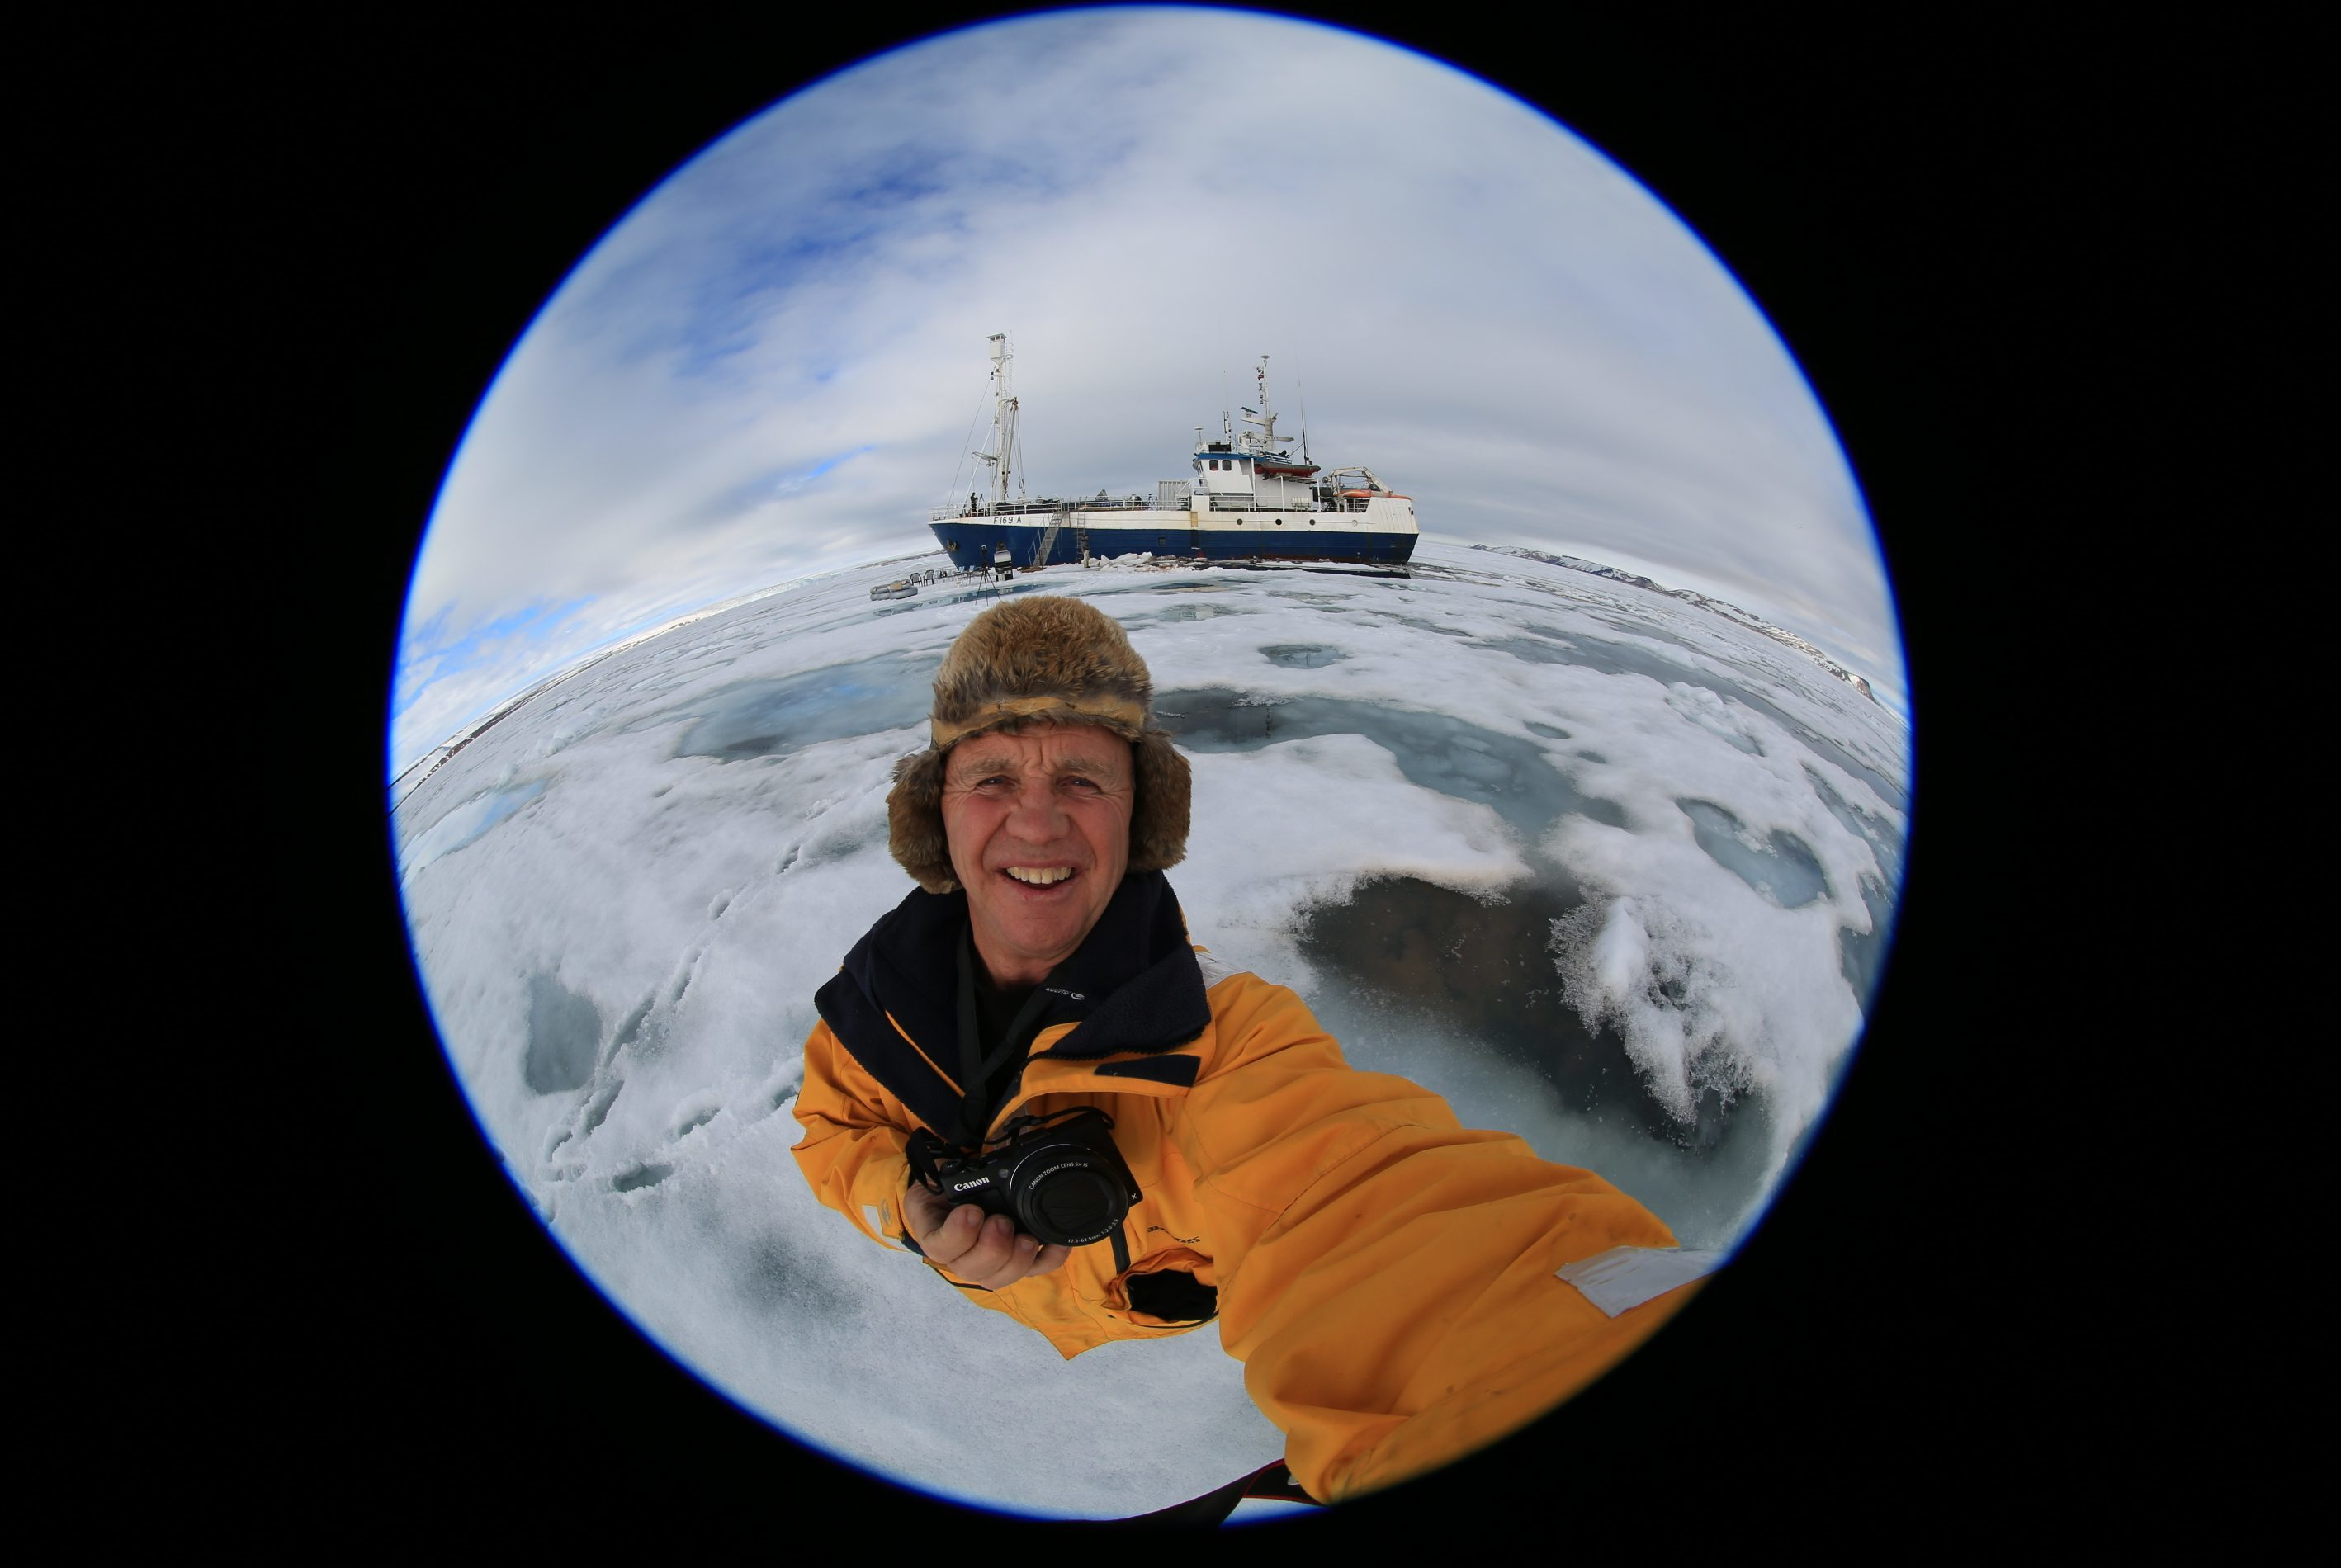 Cameraman Doug Allan on the ice.